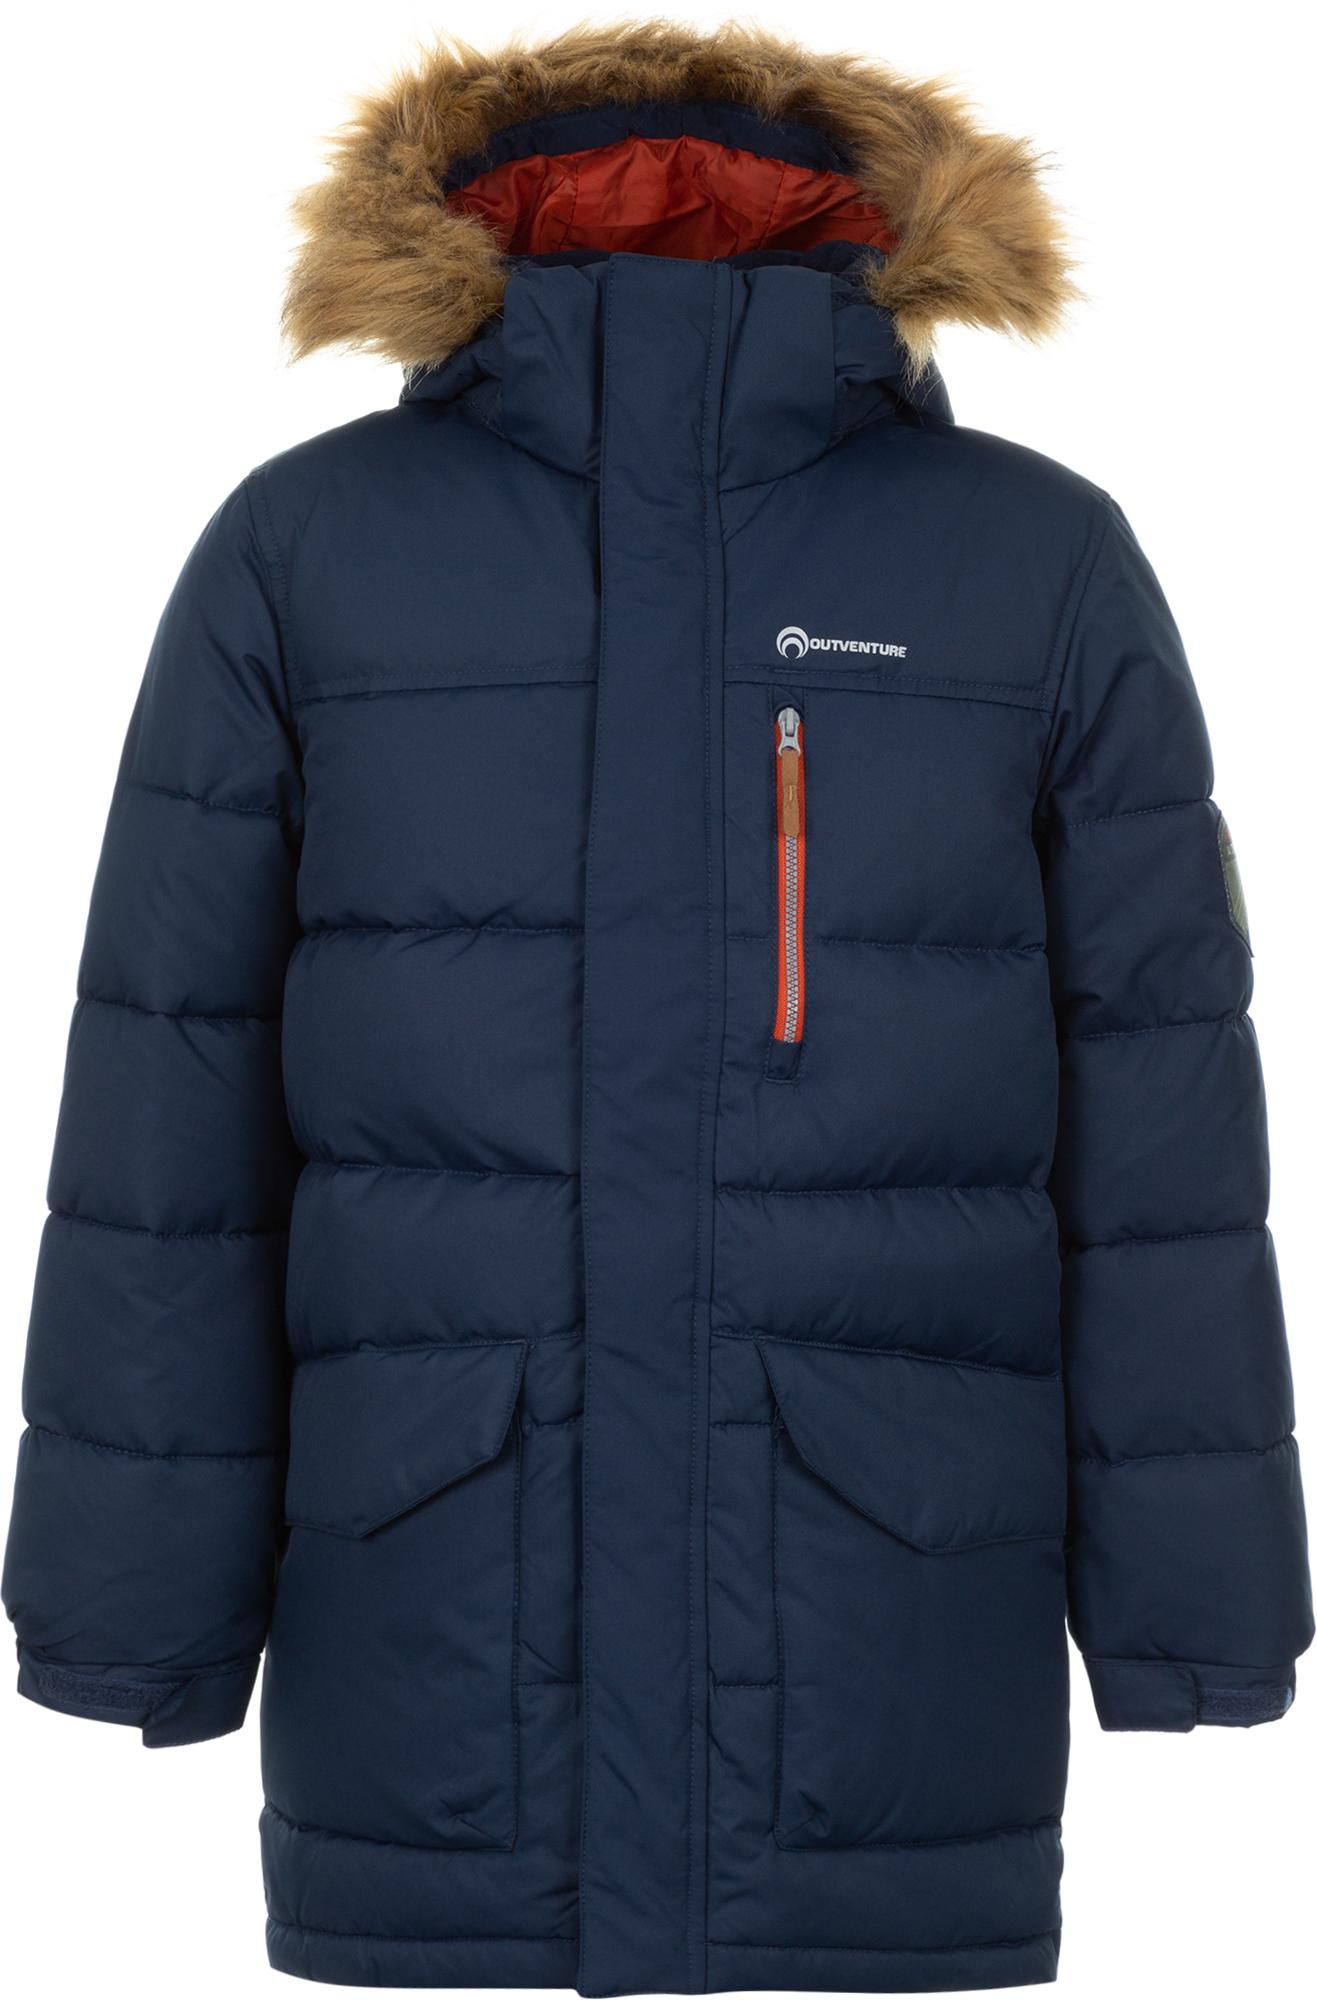 Outventure Куртка пуховая для мальчиков Outventure, размер 170